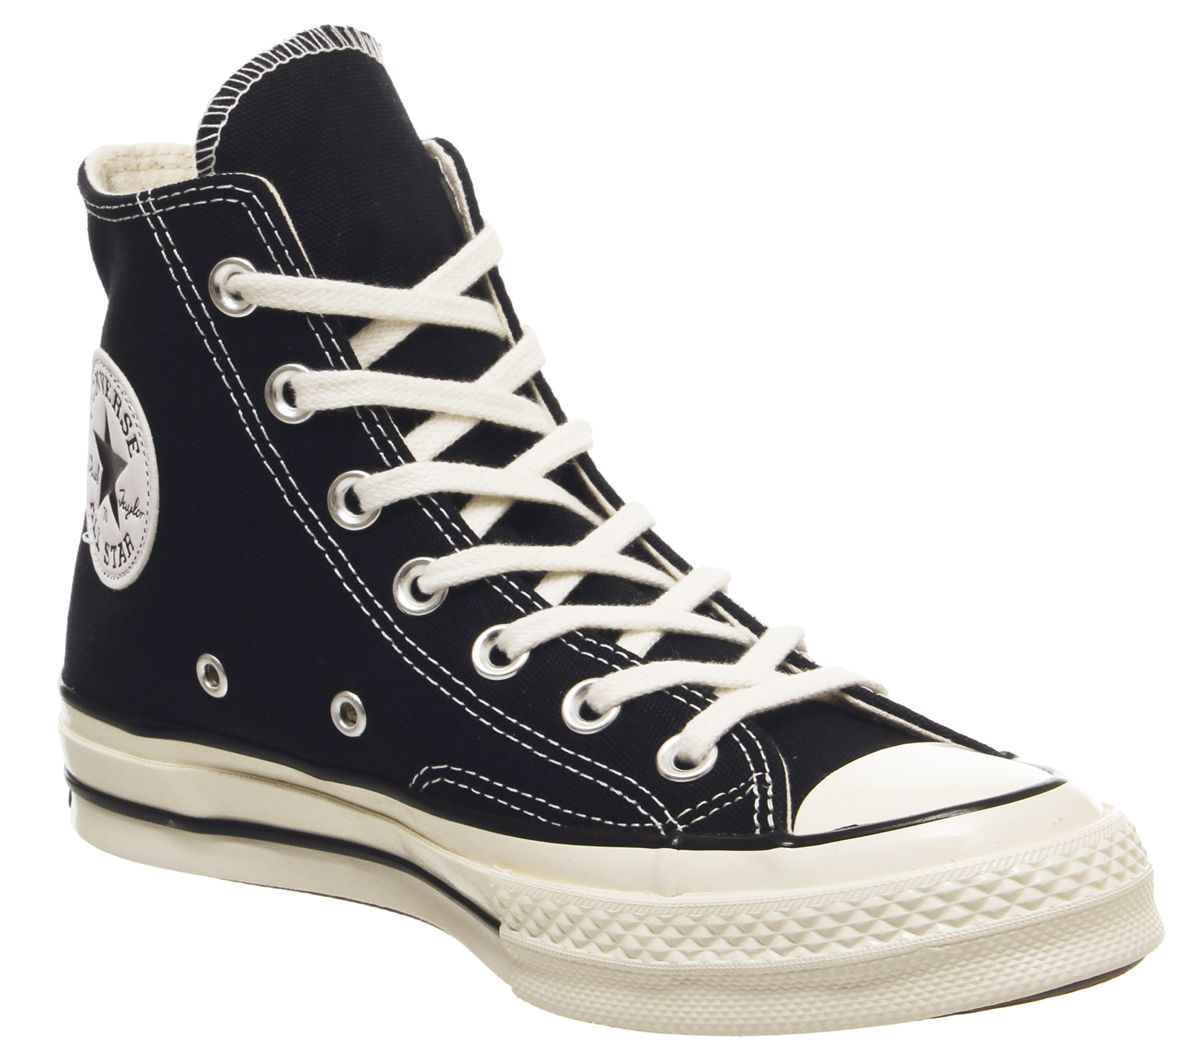 af100362e44c Converse All Star Hi 70 s Black - His trainers